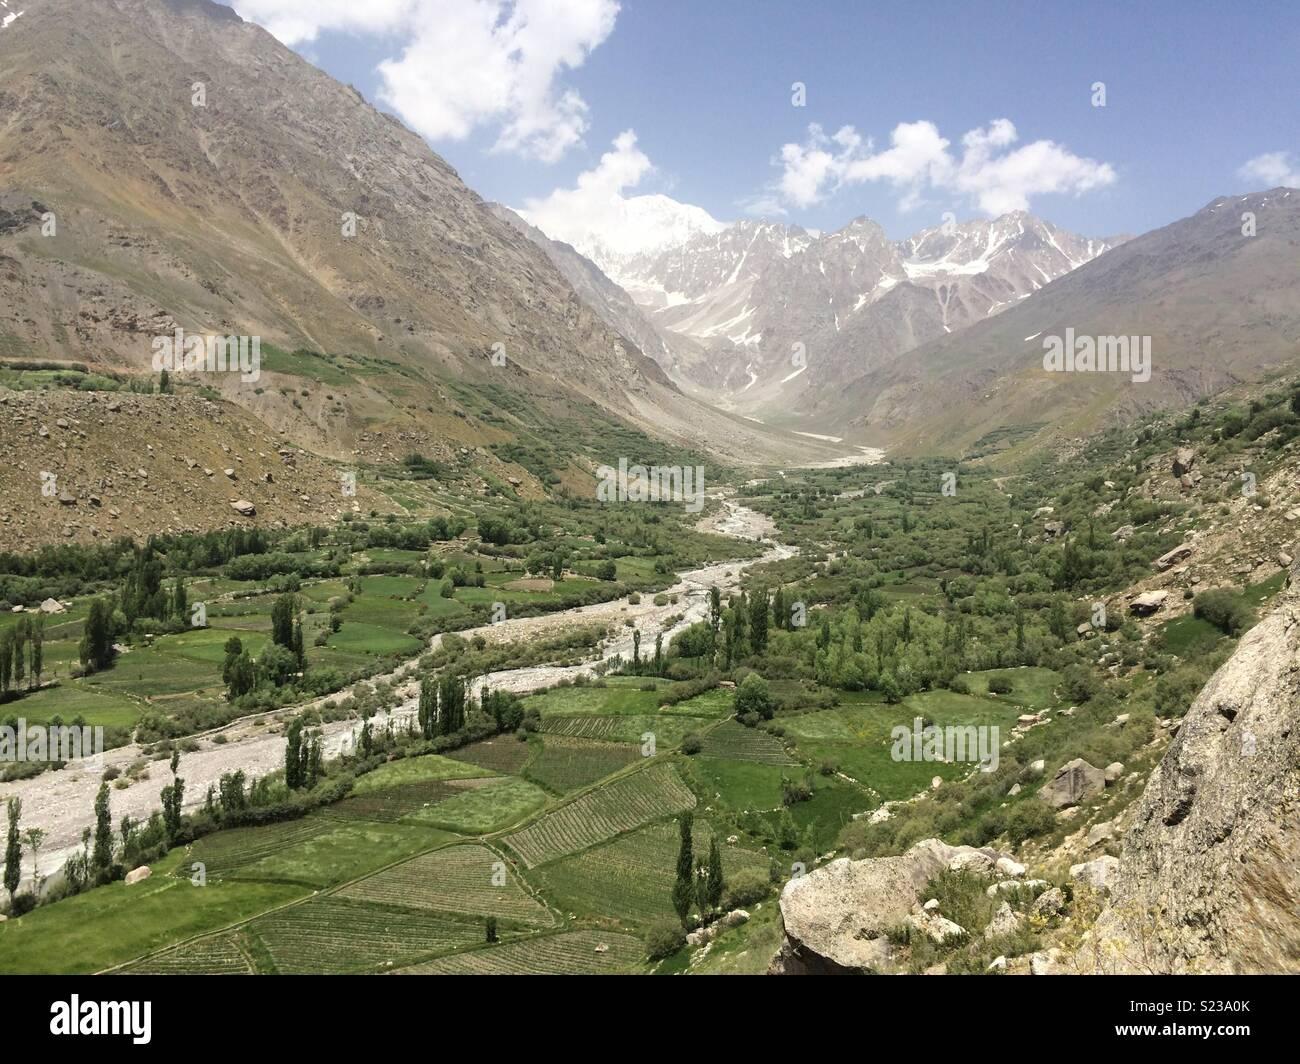 View from Kiyar Karimabad-Chitral, KPK - Stock Image